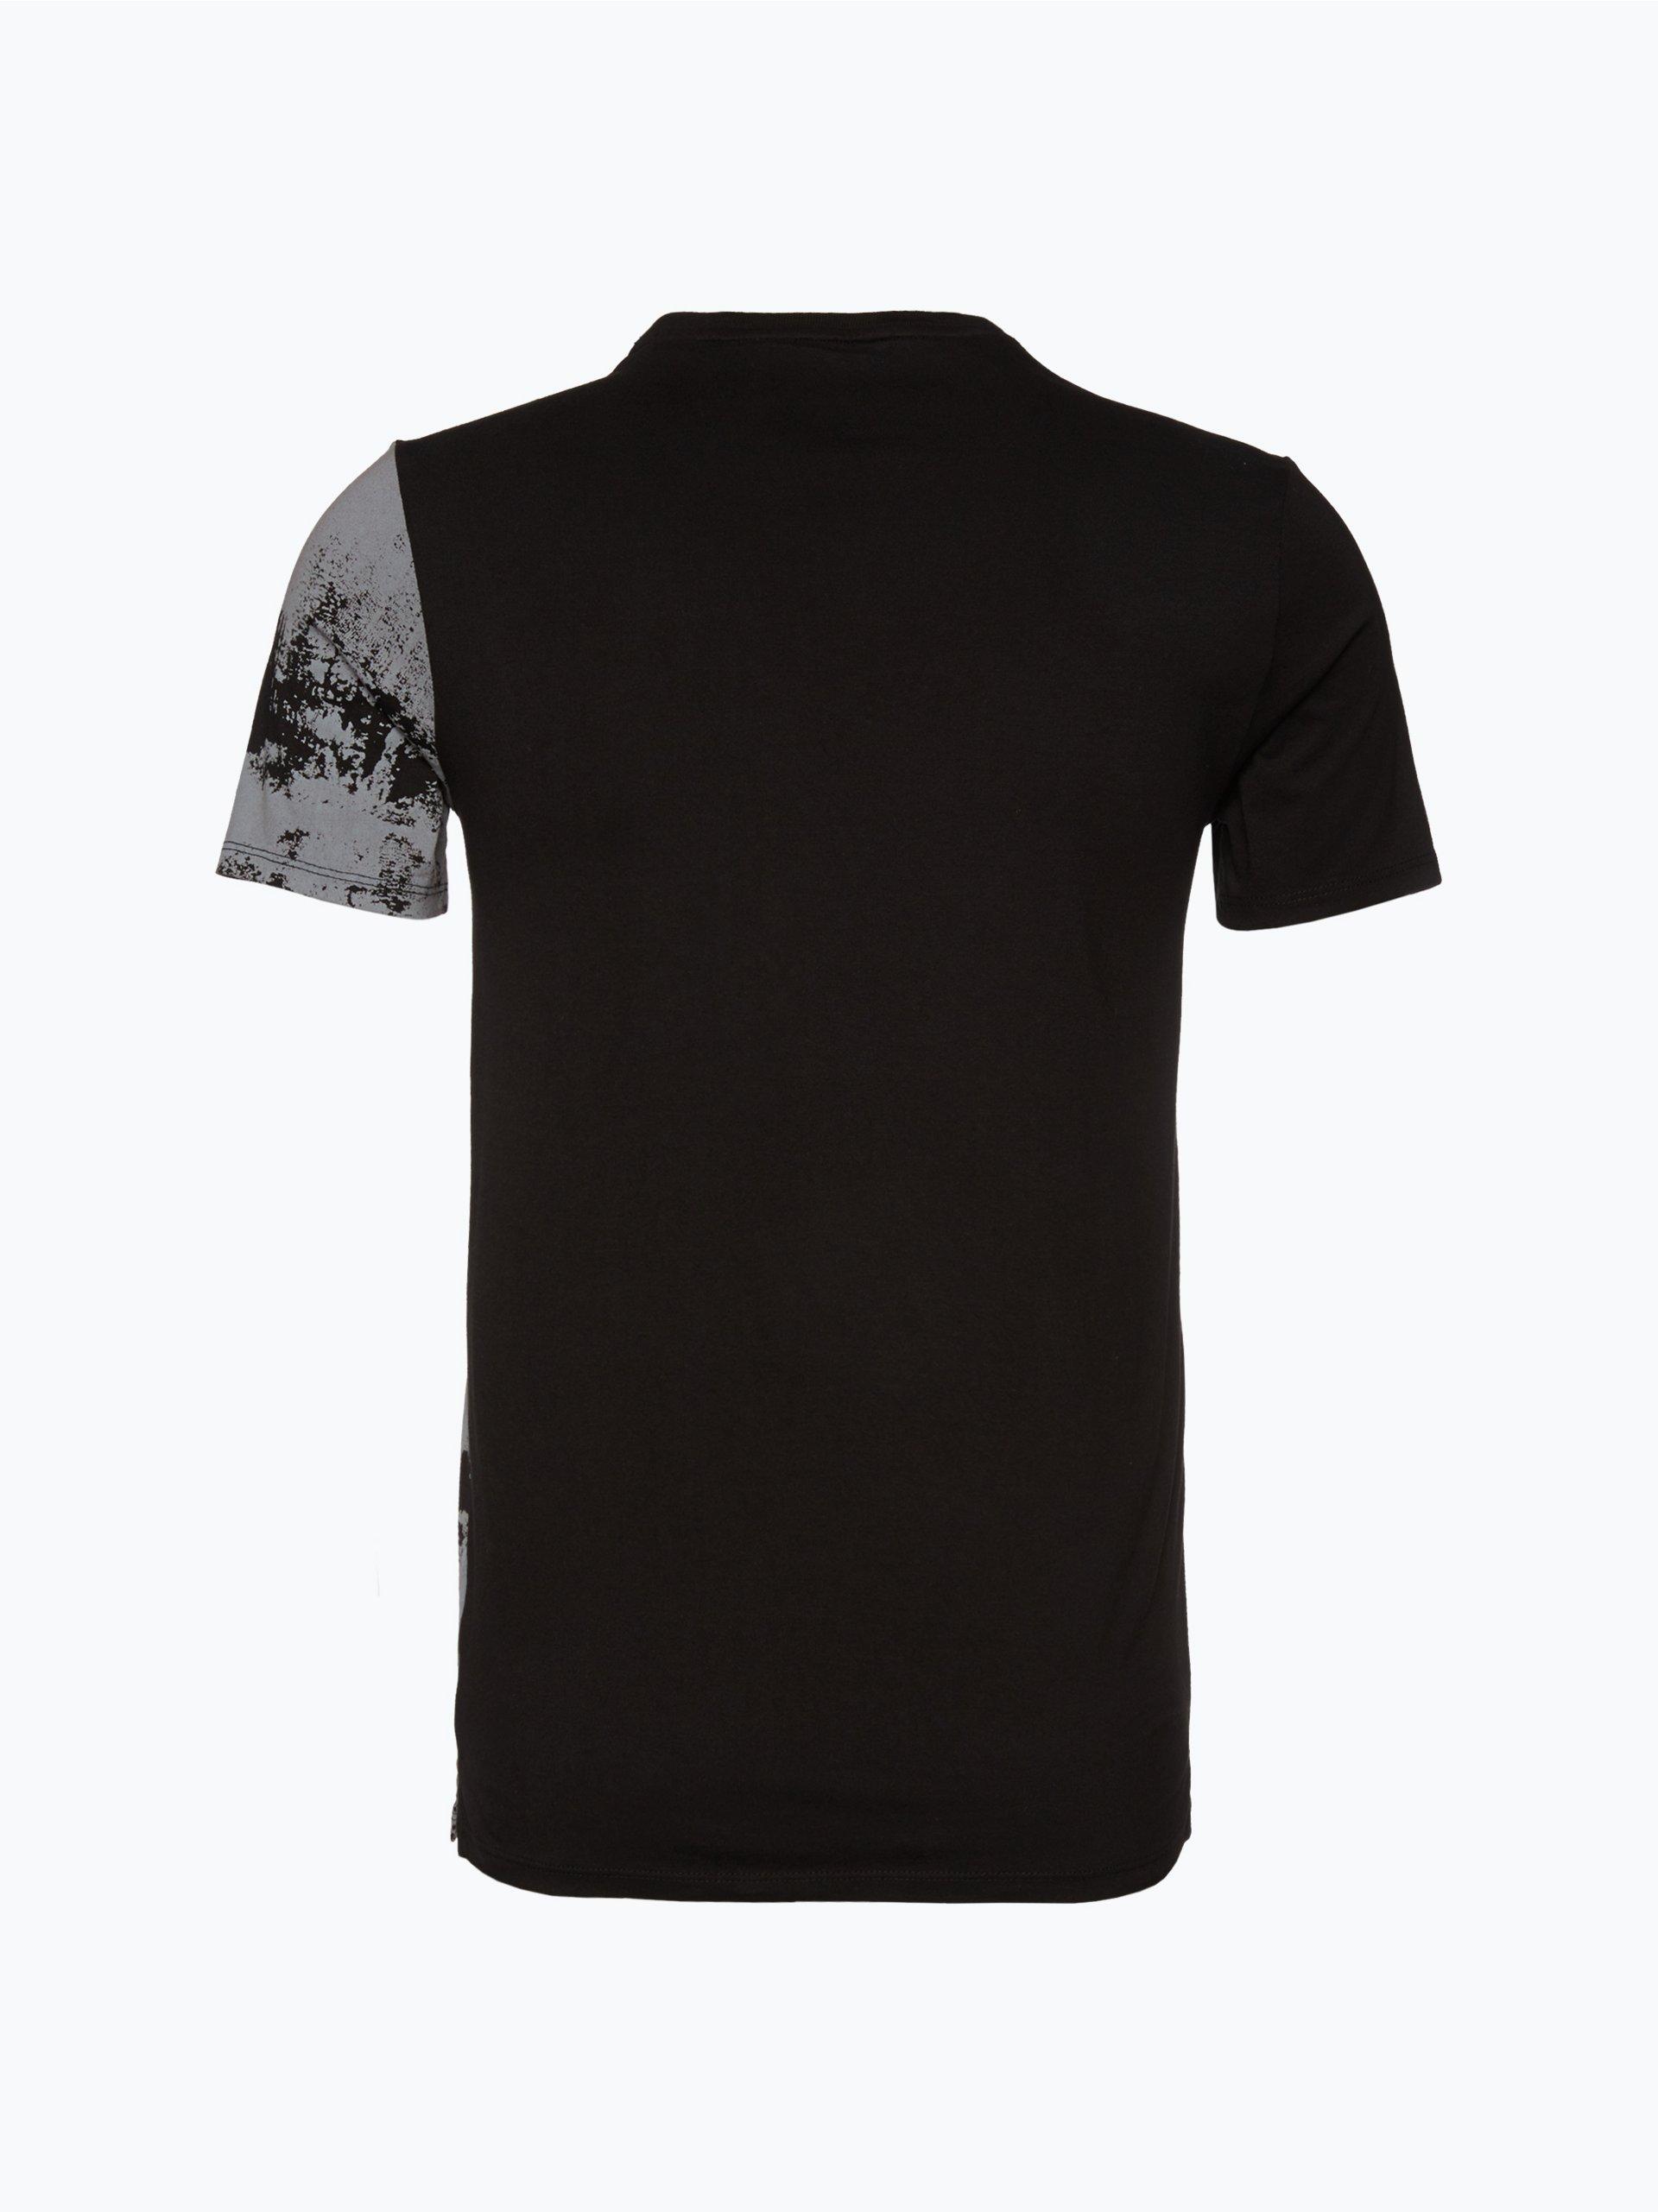 guess jeans herren t shirt schwarz gemustert online kaufen